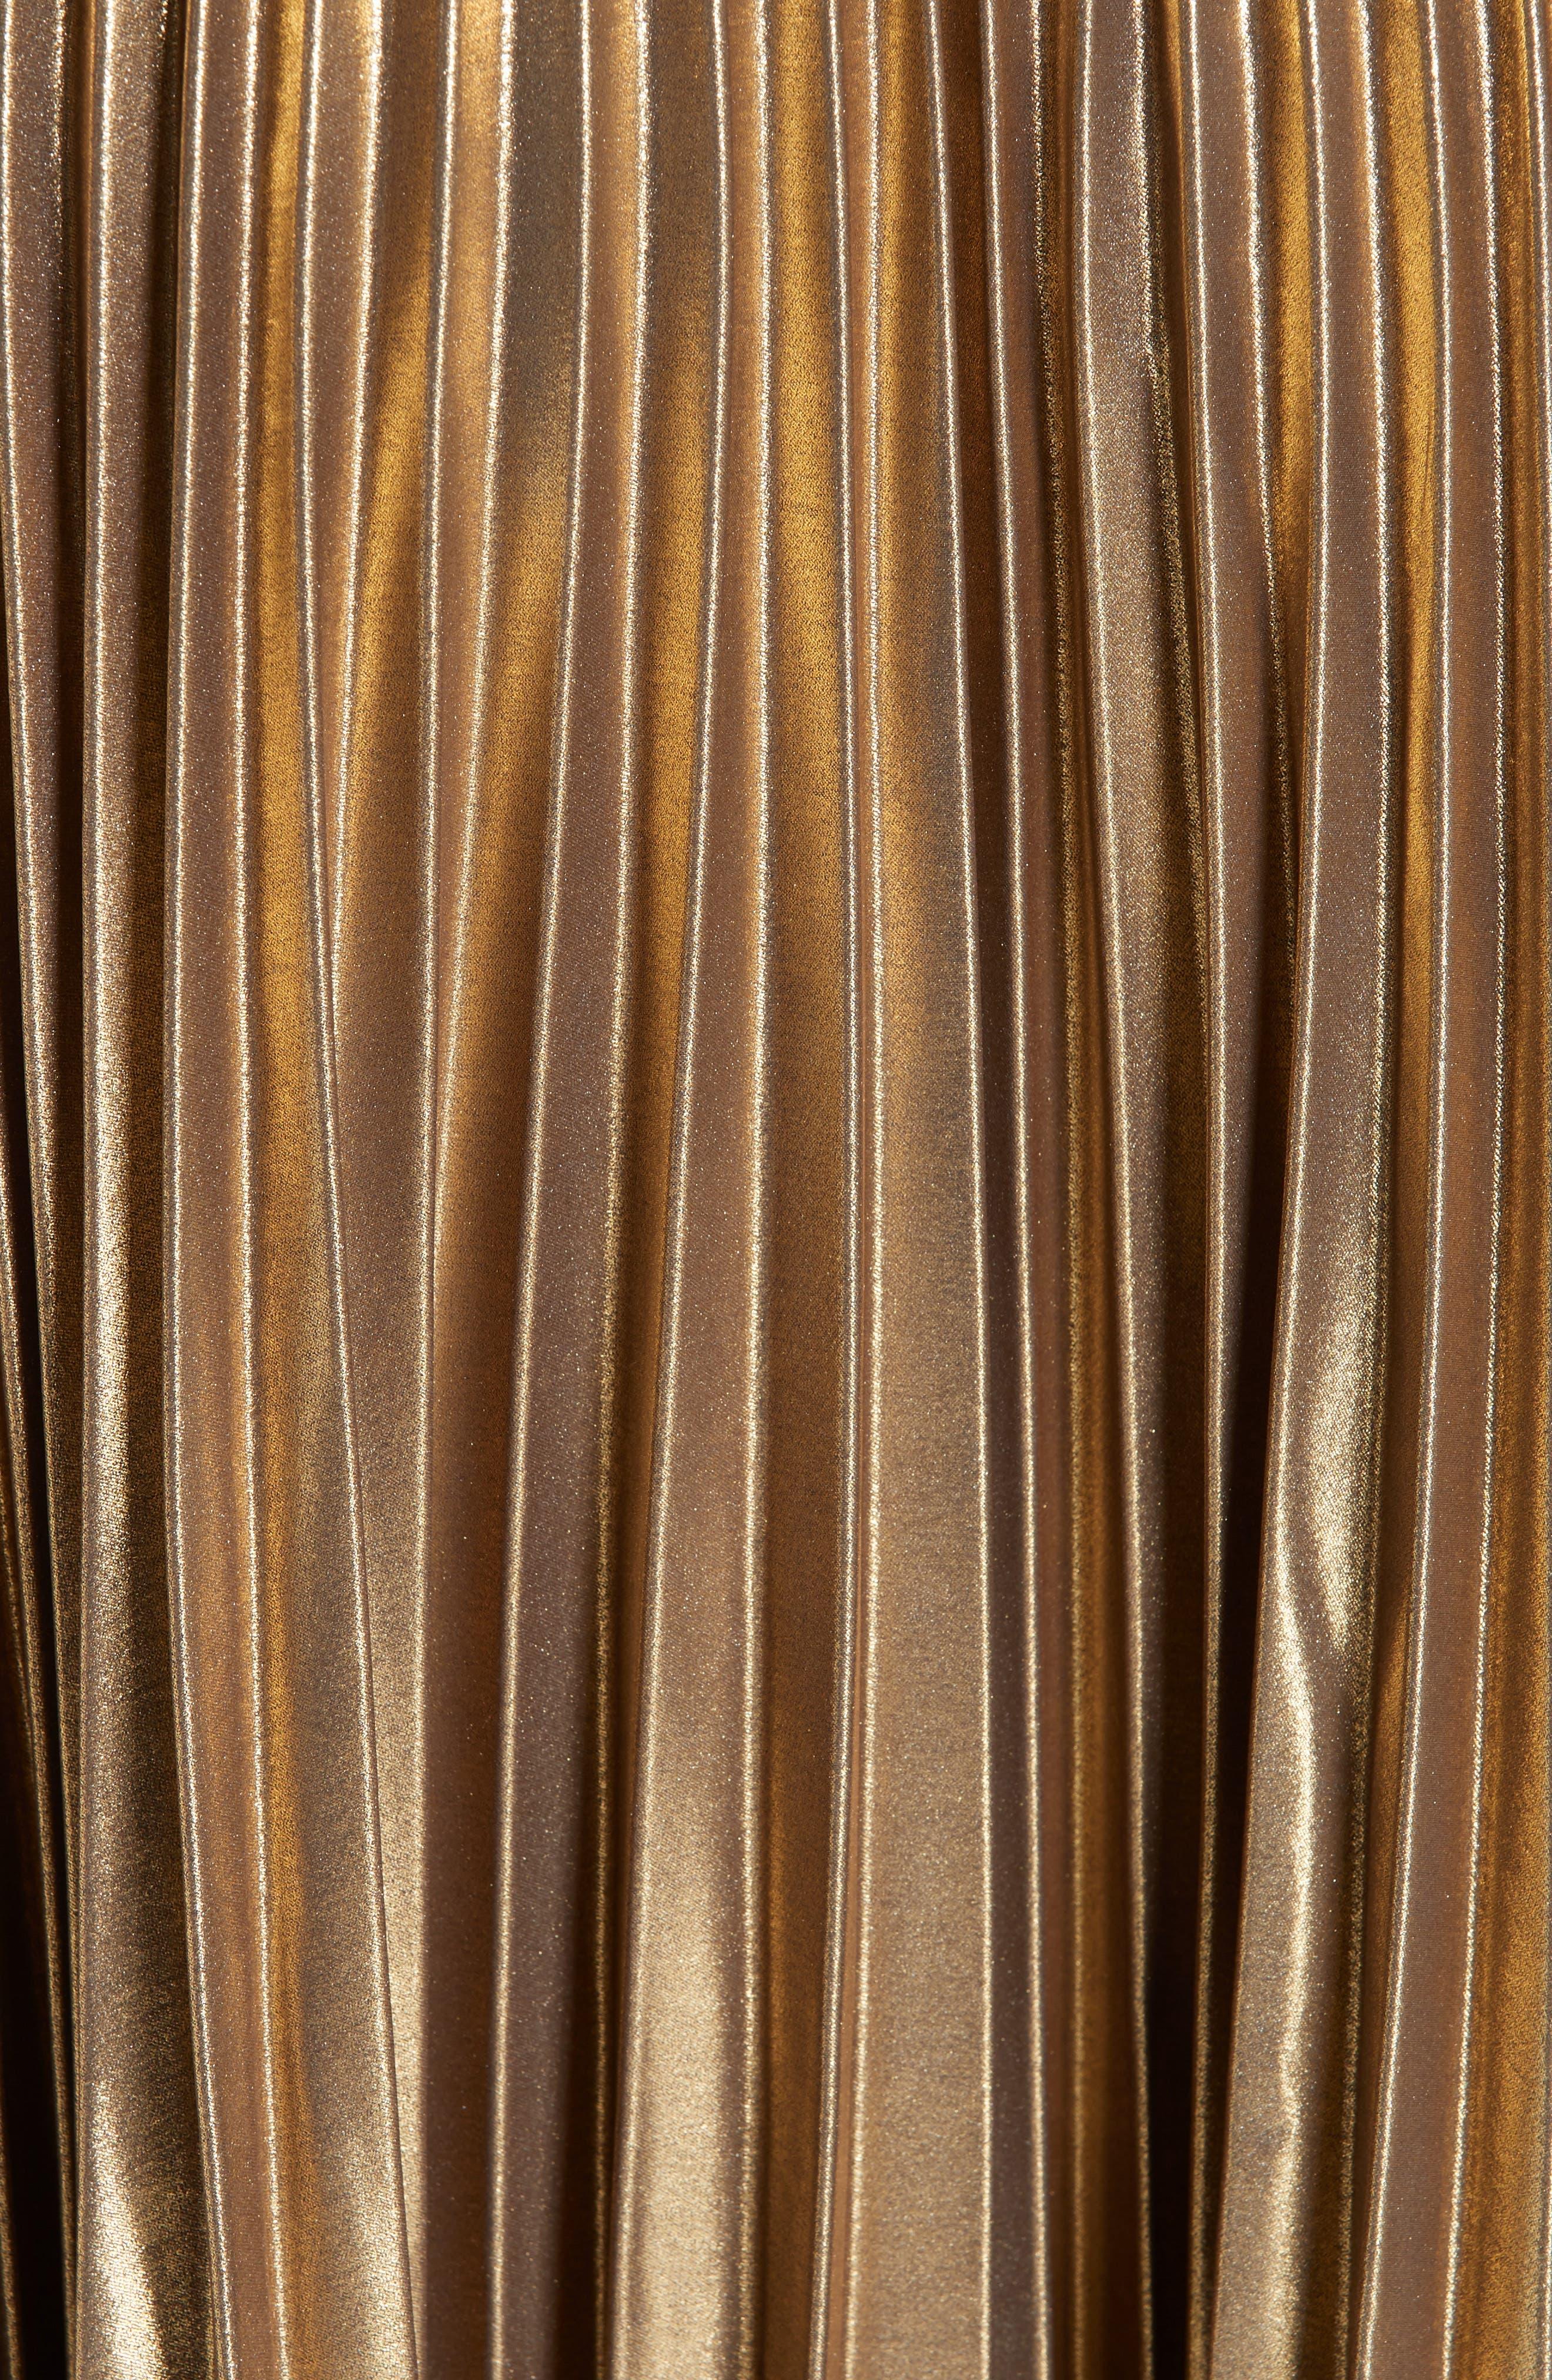 Pleated Metallic Skirt,                             Alternate thumbnail 5, color,                             710